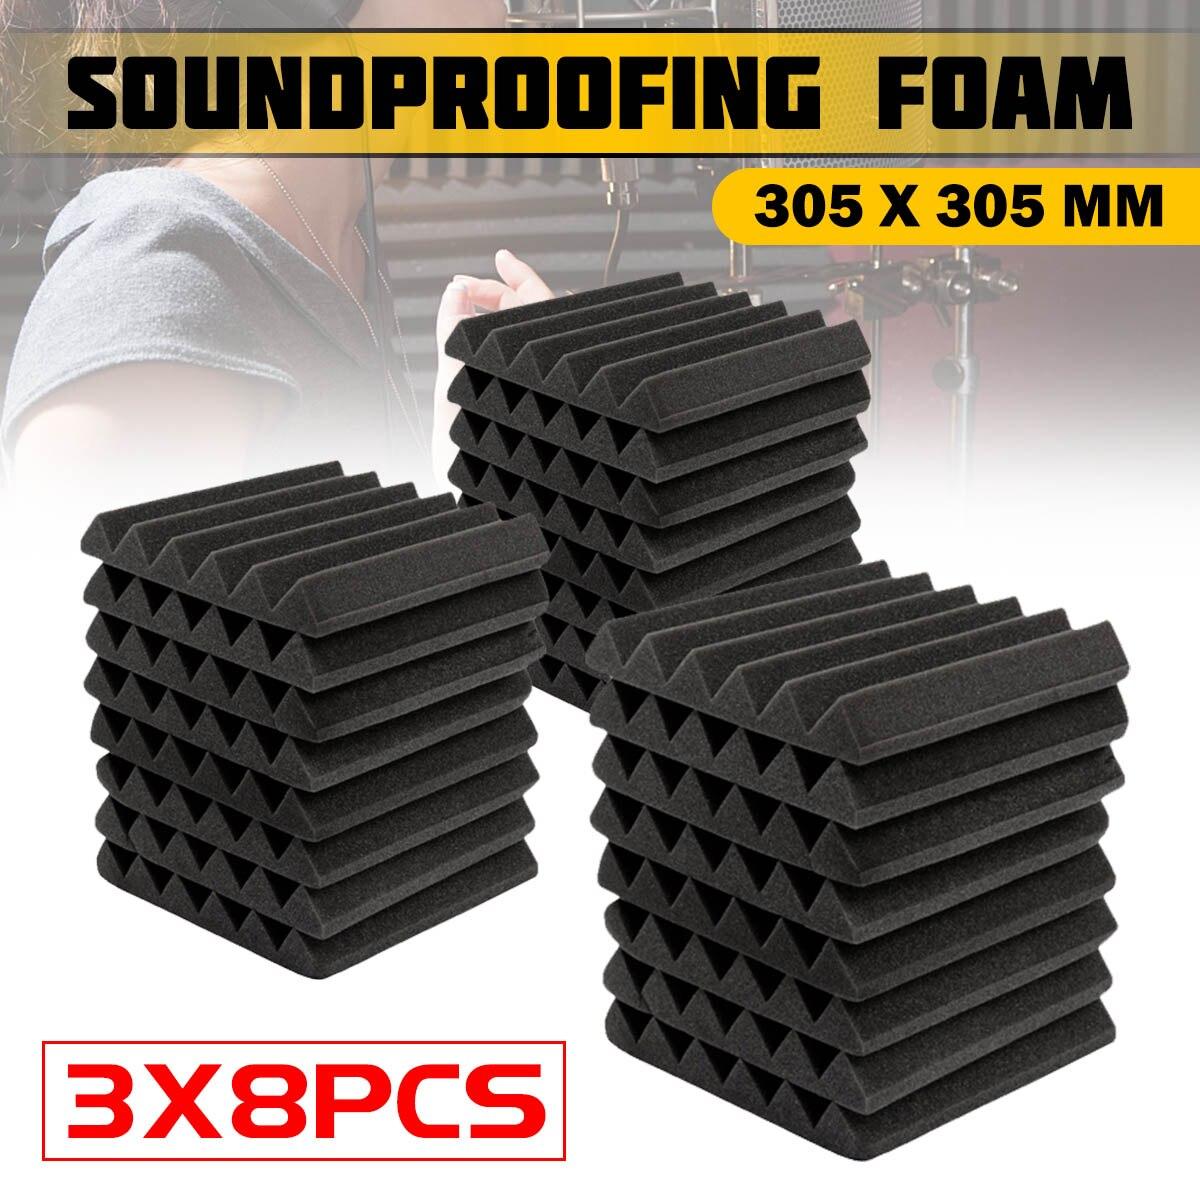 3x8Pcs 305 x 305 x 45mm Soundproofing Foam Acoustic Foam Sound Treatment Studio Room Absorption Tiles Polyurethane foam3x8Pcs 305 x 305 x 45mm Soundproofing Foam Acoustic Foam Sound Treatment Studio Room Absorption Tiles Polyurethane foam